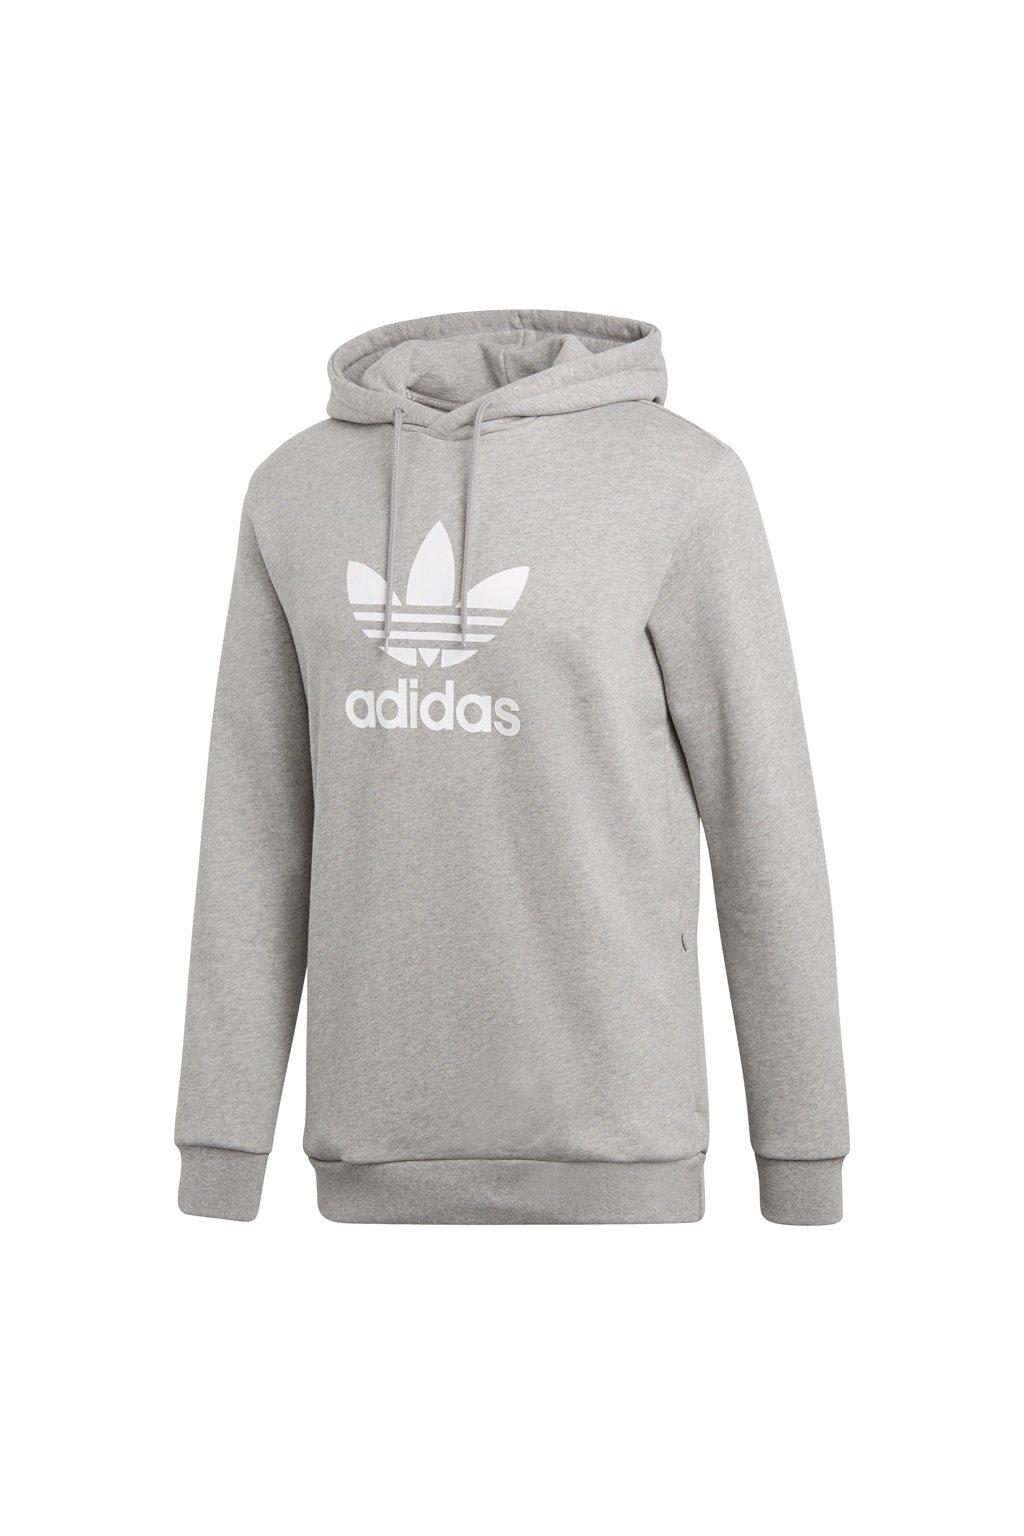 Pánska mikina s kapucňou Adidas Trefoil šedá CY4572